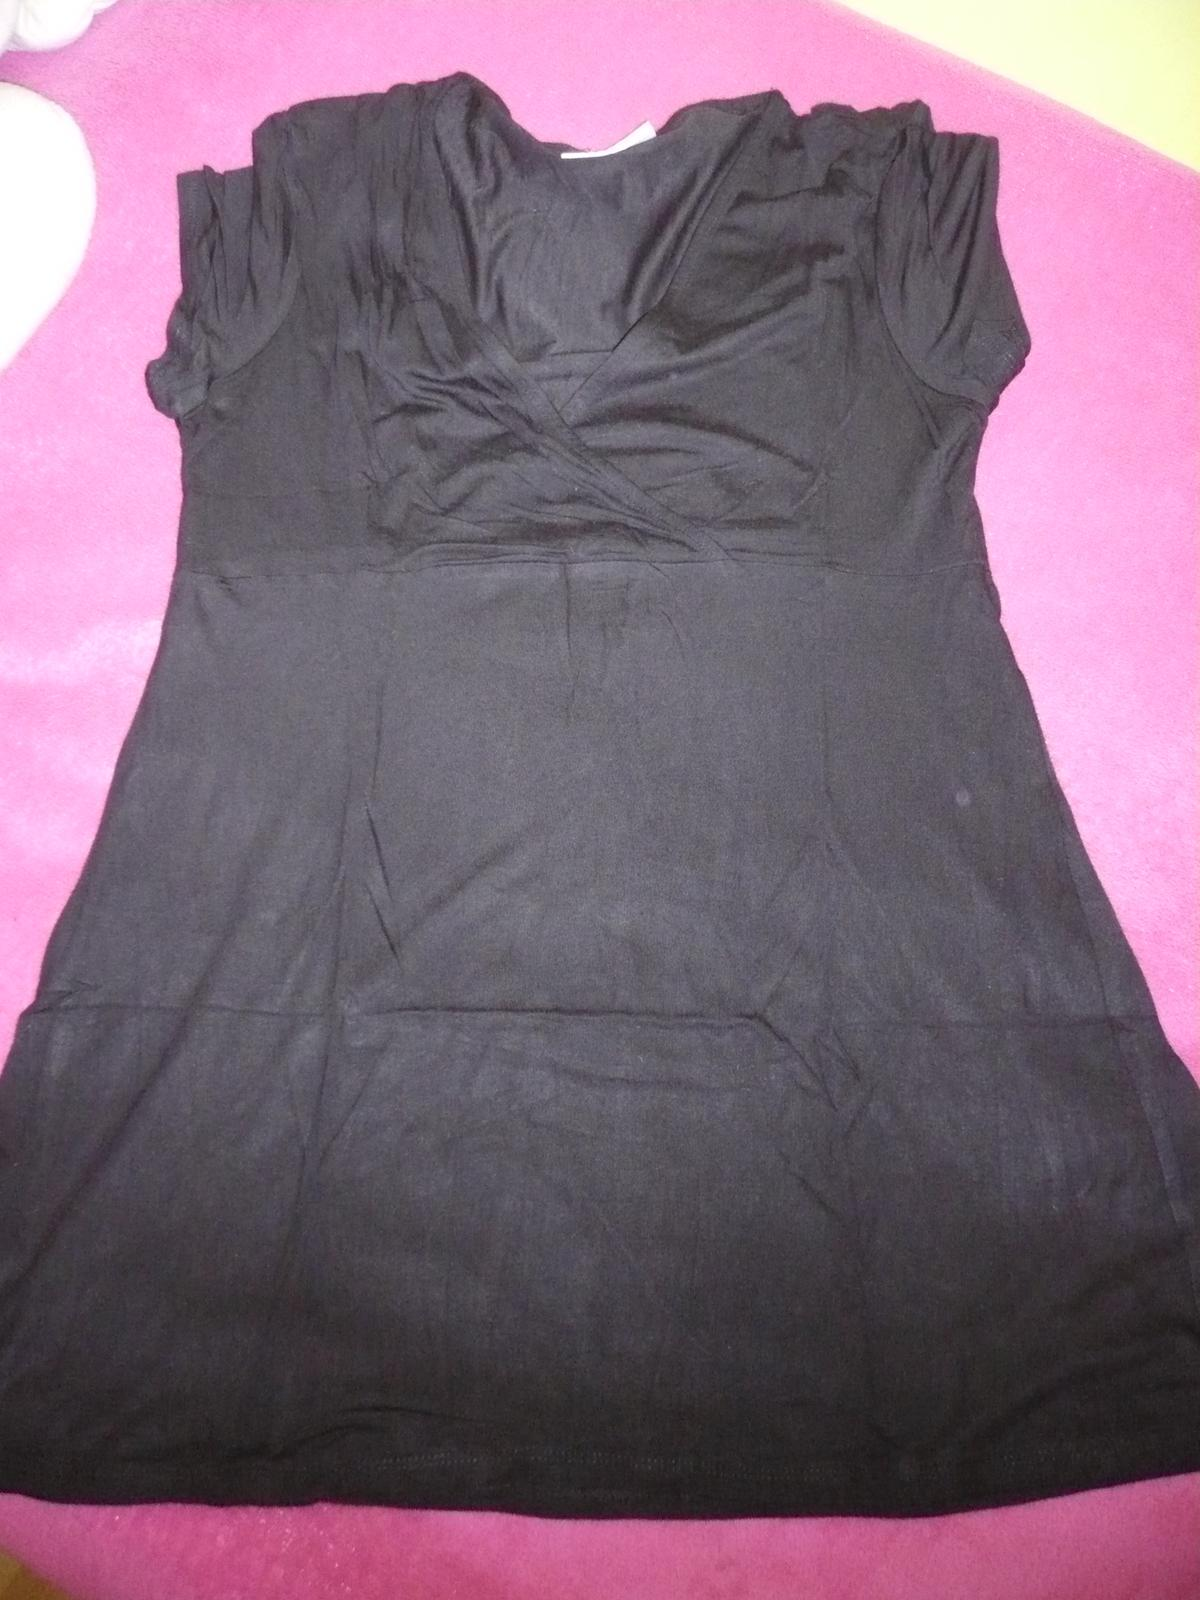 Šaty/top - Obrázok č. 1